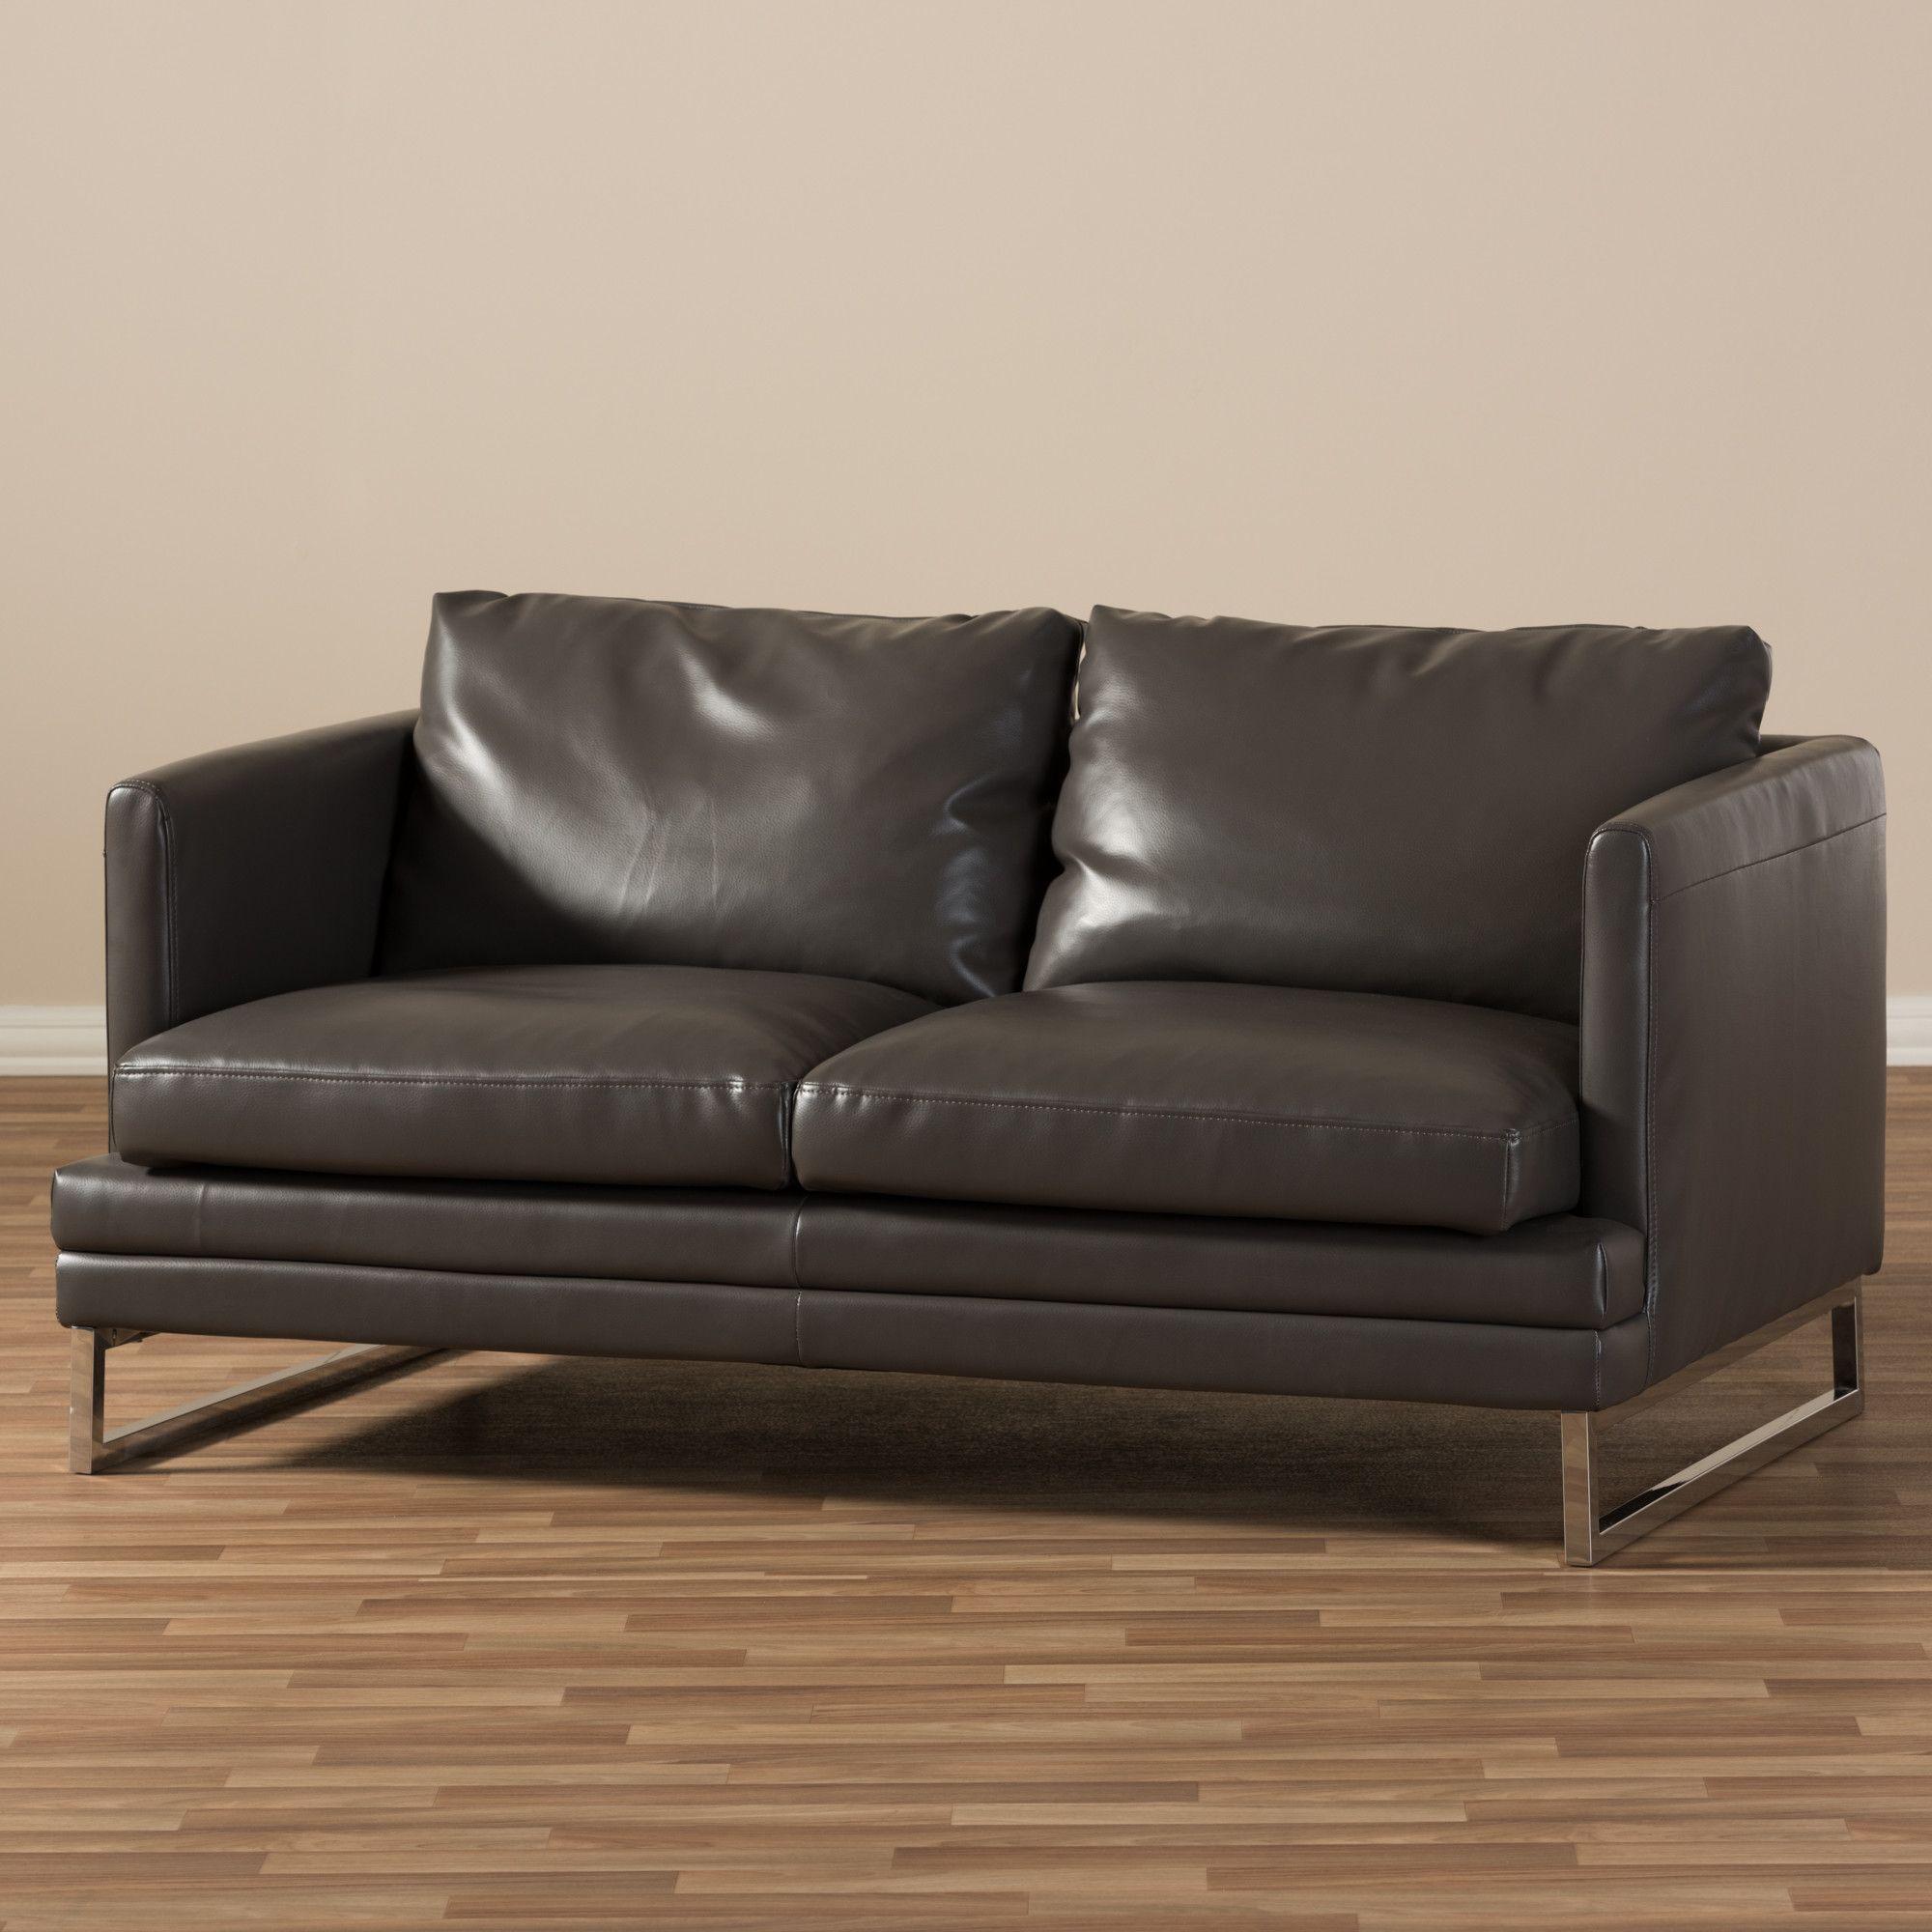 Outstanding Baxton Studio Dakota Leather Loveseat Products Leather Creativecarmelina Interior Chair Design Creativecarmelinacom